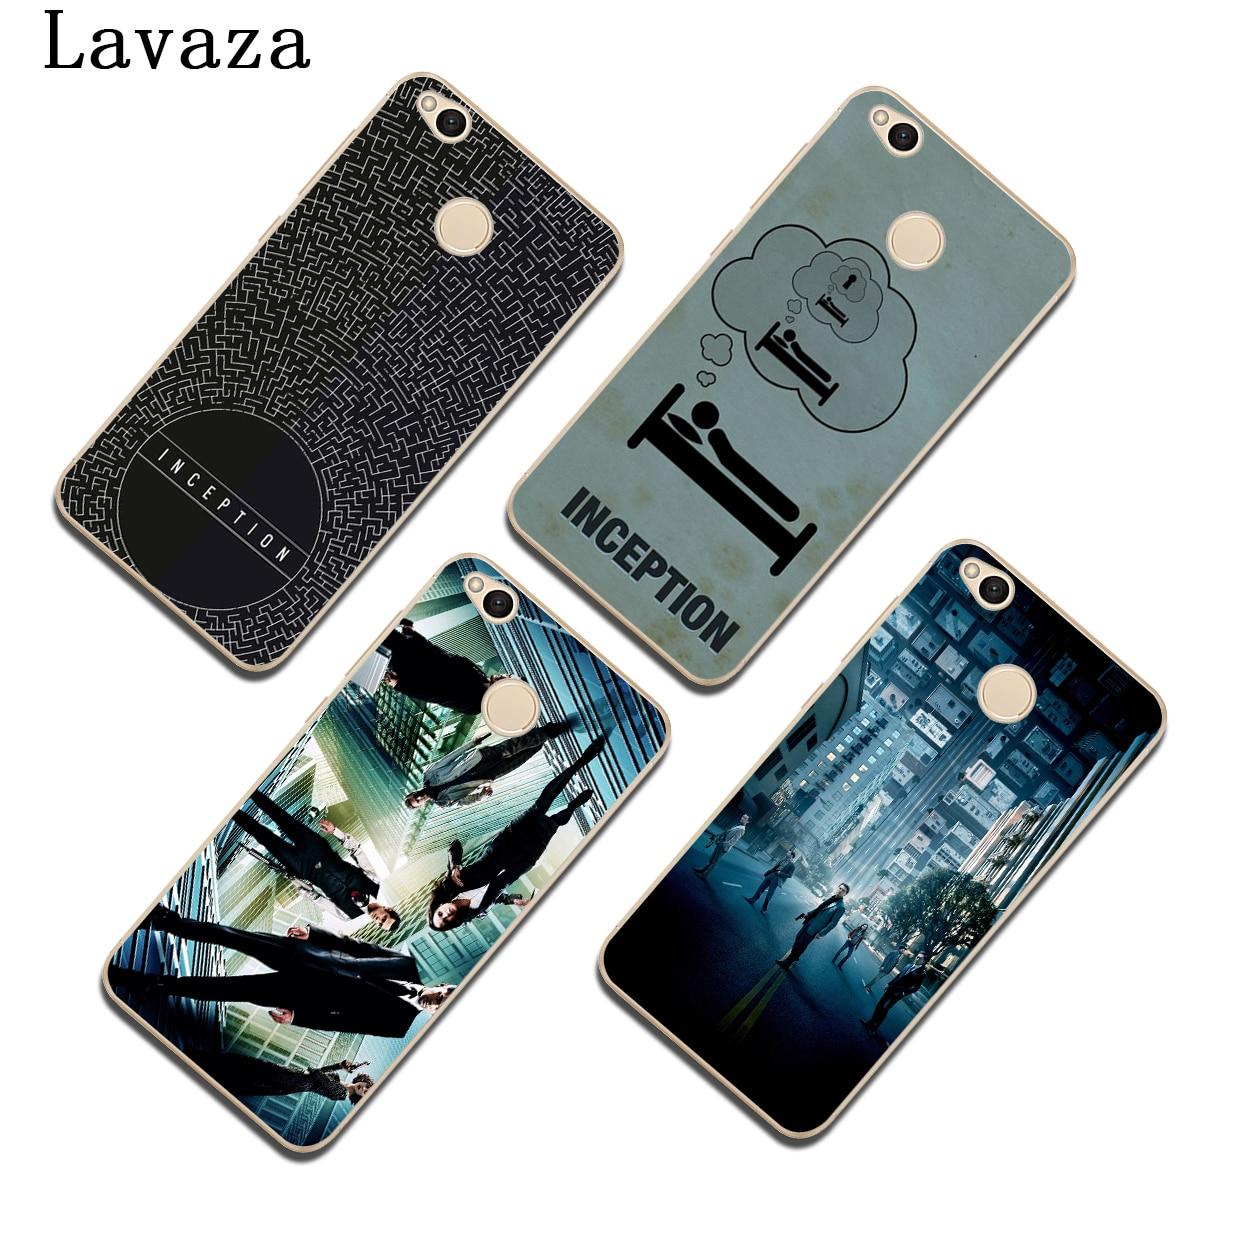 Lavaza Леонардо Ди Каприо создания телефон чехол для сяо mi красный mi 4X mi A1 6 5 5X 5S плюс Примечание 5A 4A 2 3 3 s 4 Pro премьер 4X mi A1 mi 6